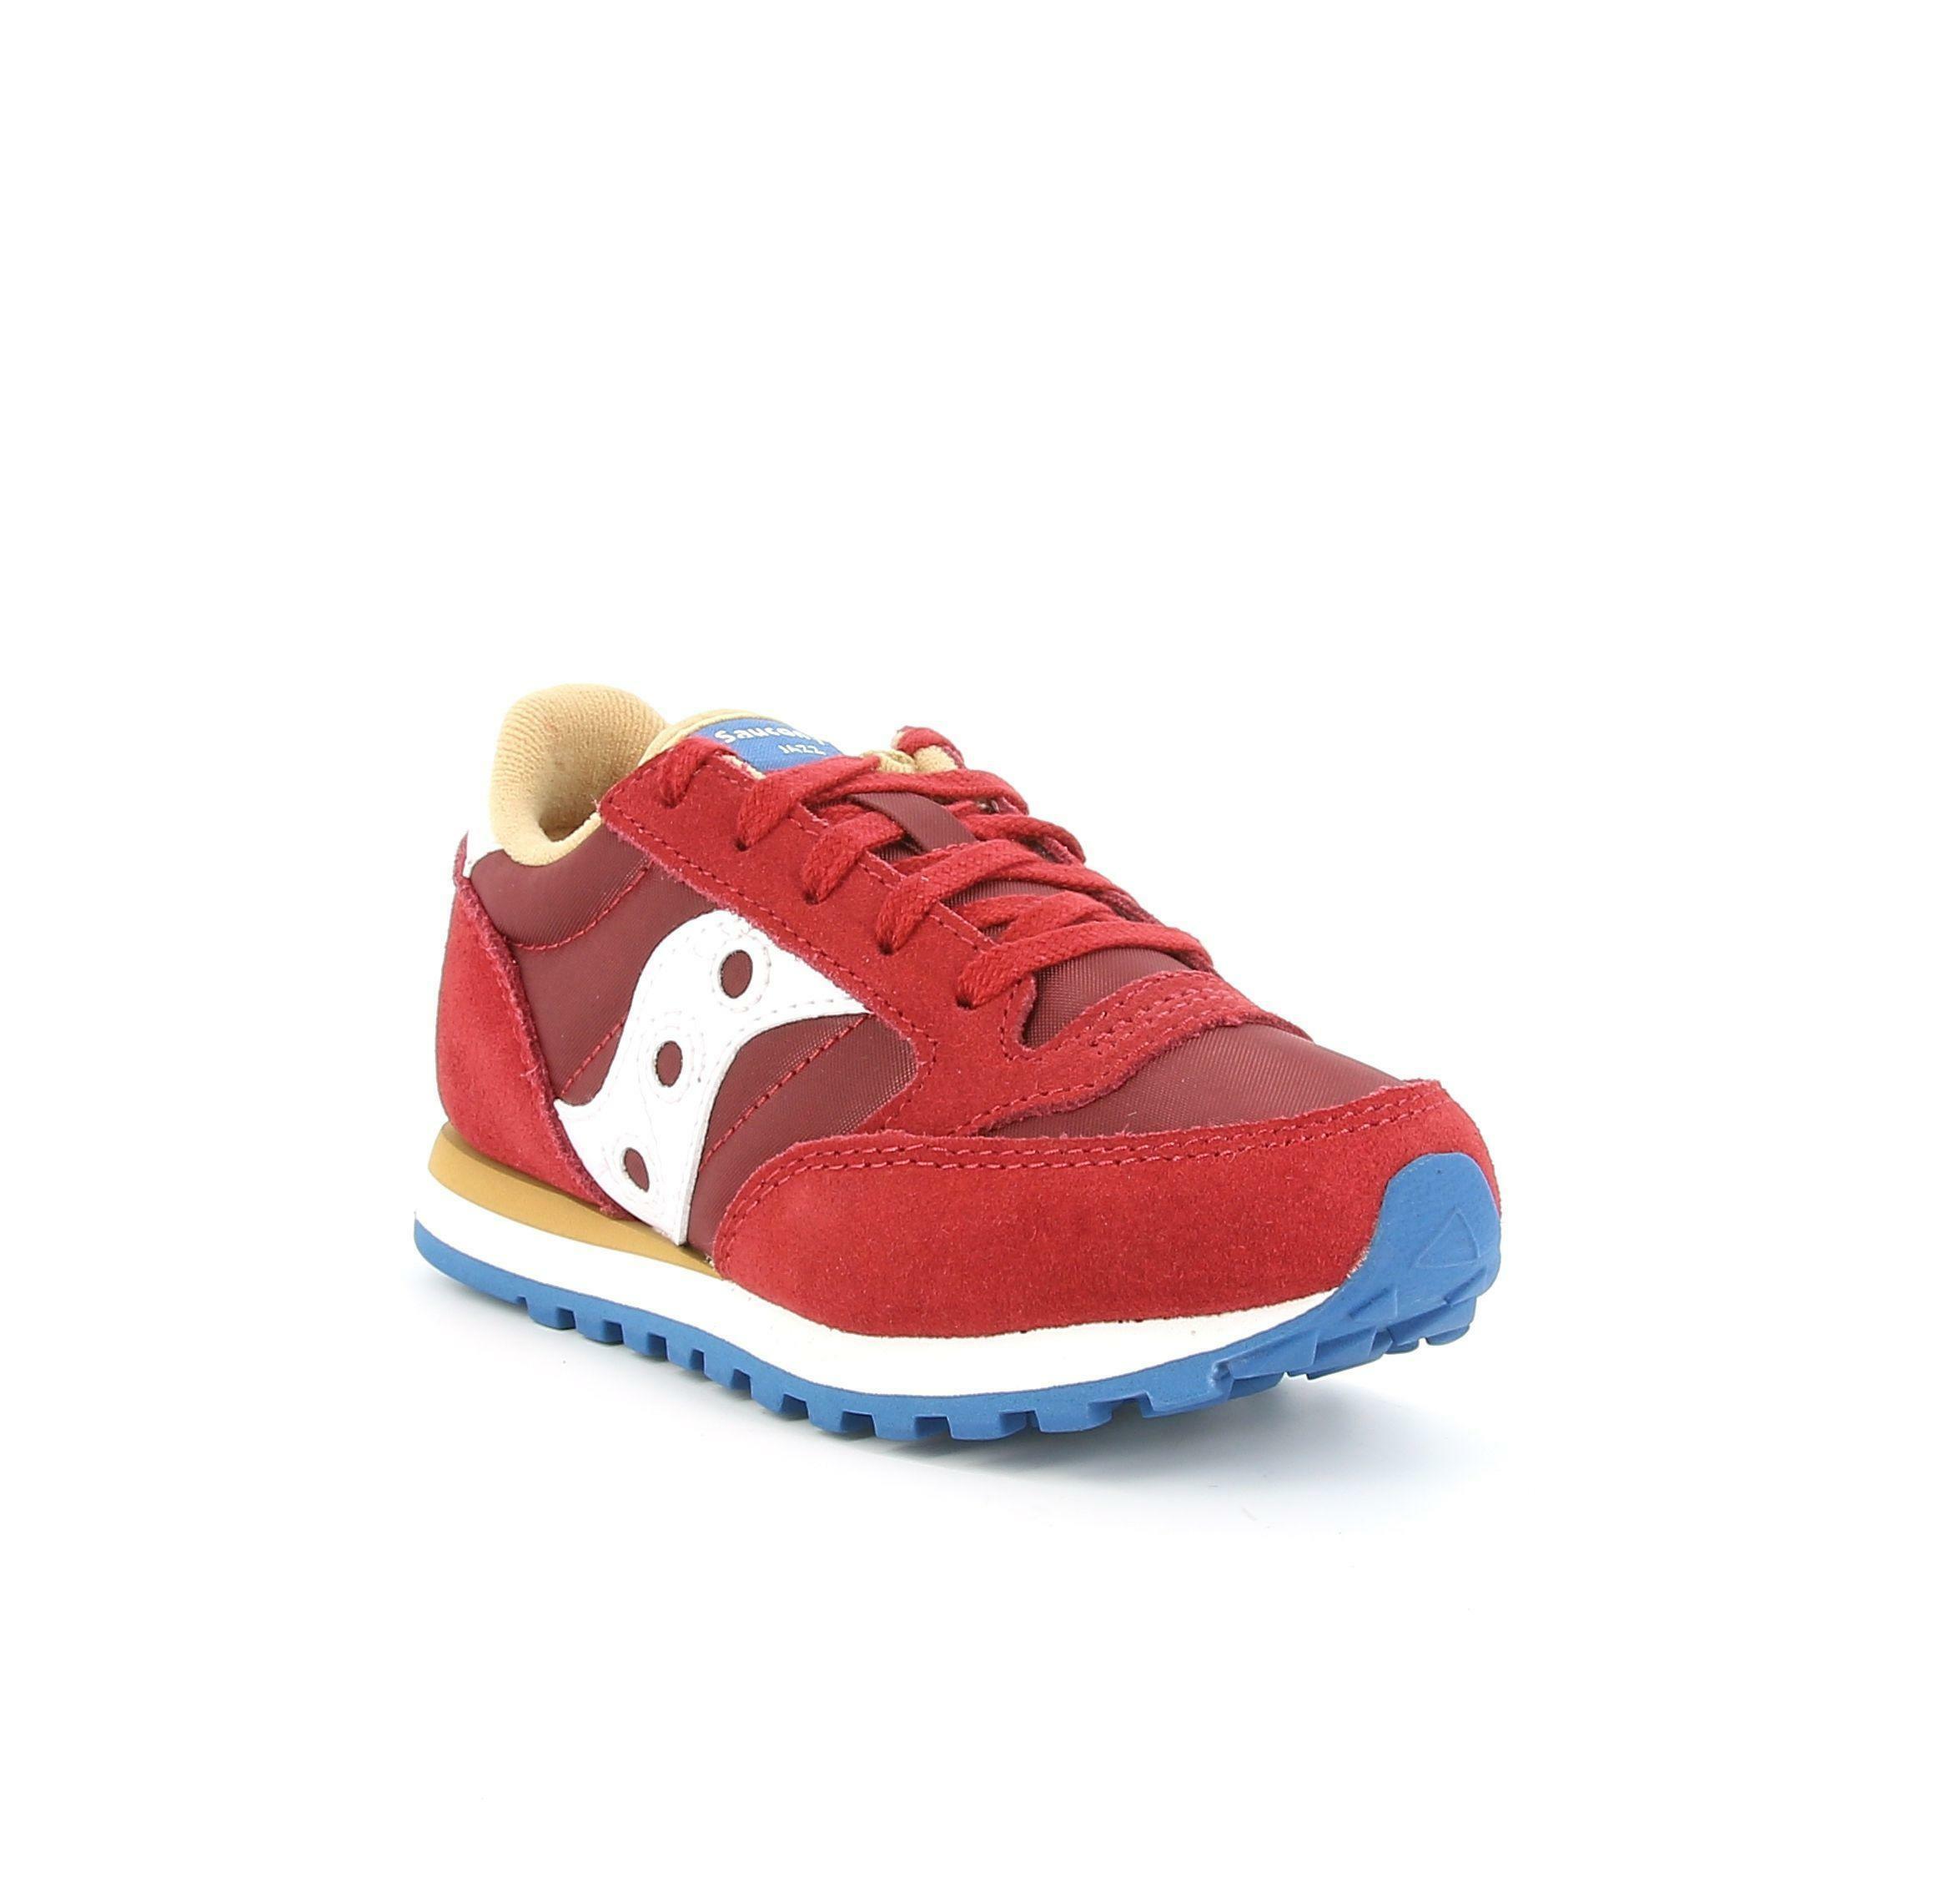 saucony saucony sneakers sk263318 bordeaux sneakers bambino bordeaux